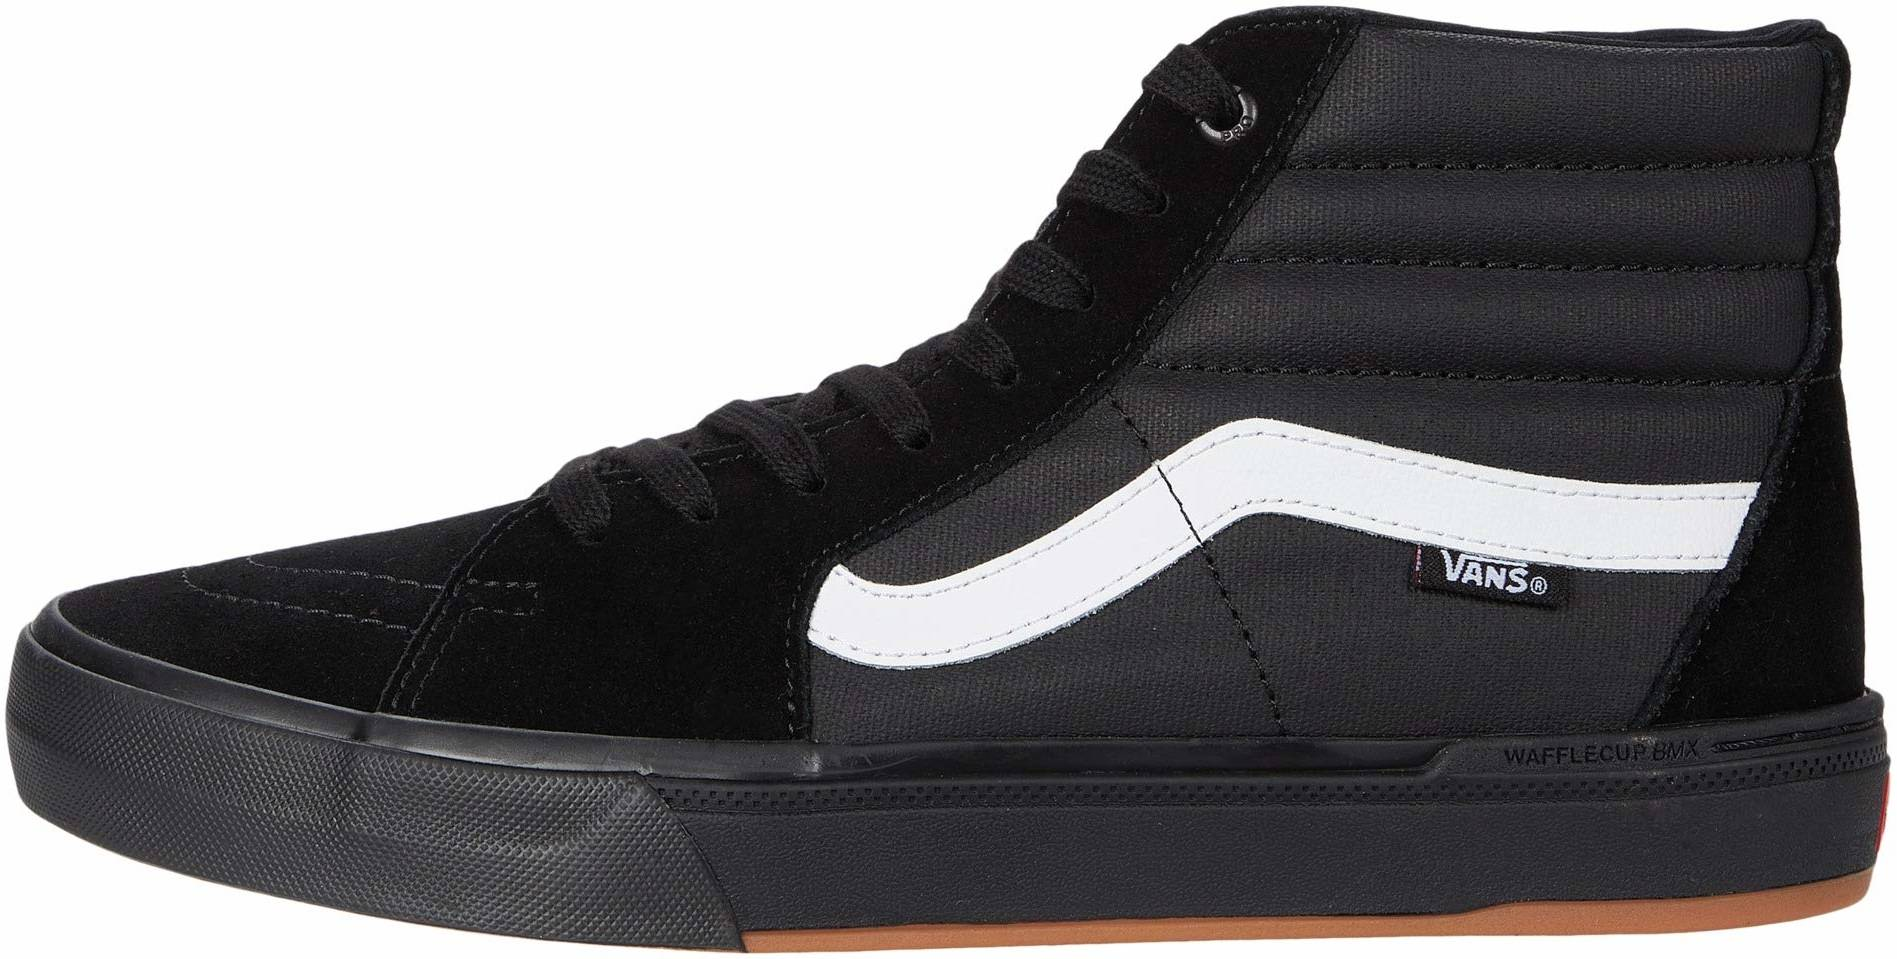 Vans SK8-Hi Pro BMX sneakers in black   RunRepeat